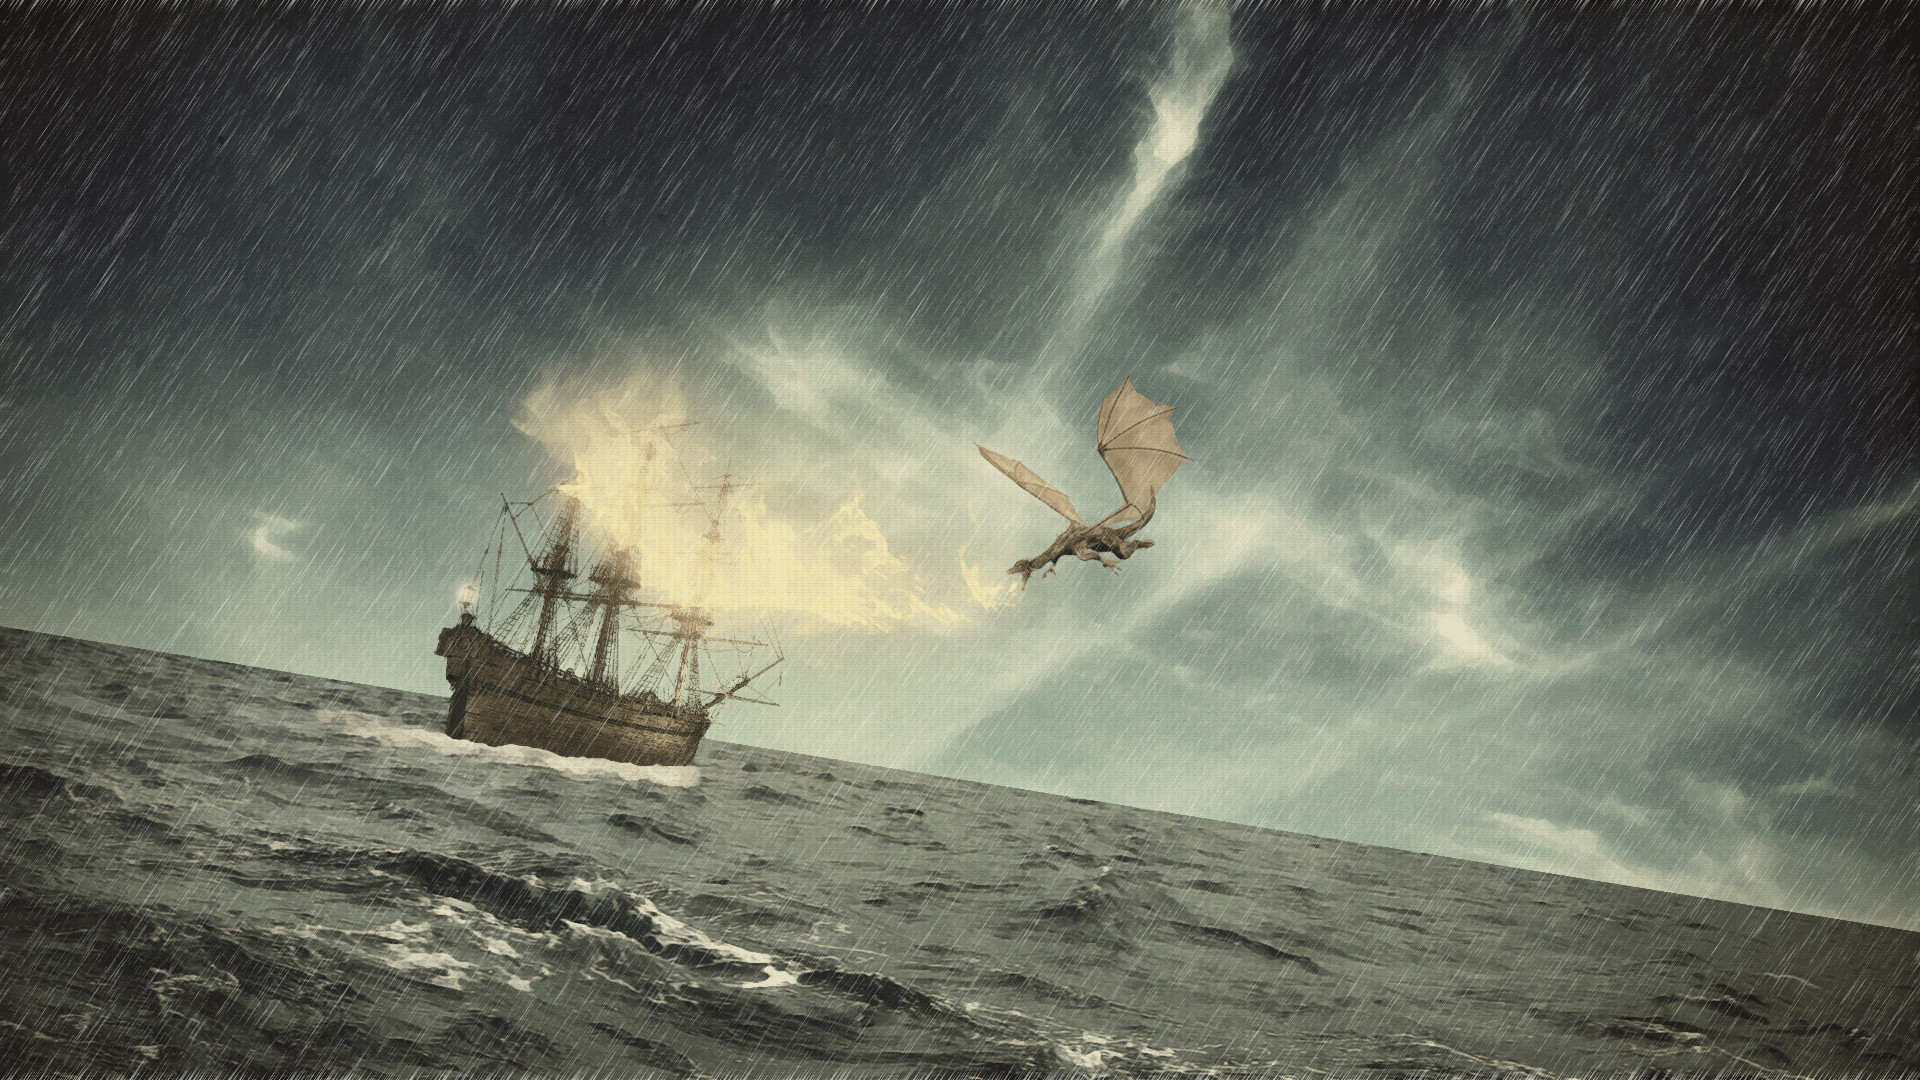 Rain Storm | Download wallpaper sea, waves, storm, rain free desktop  wallpaper in